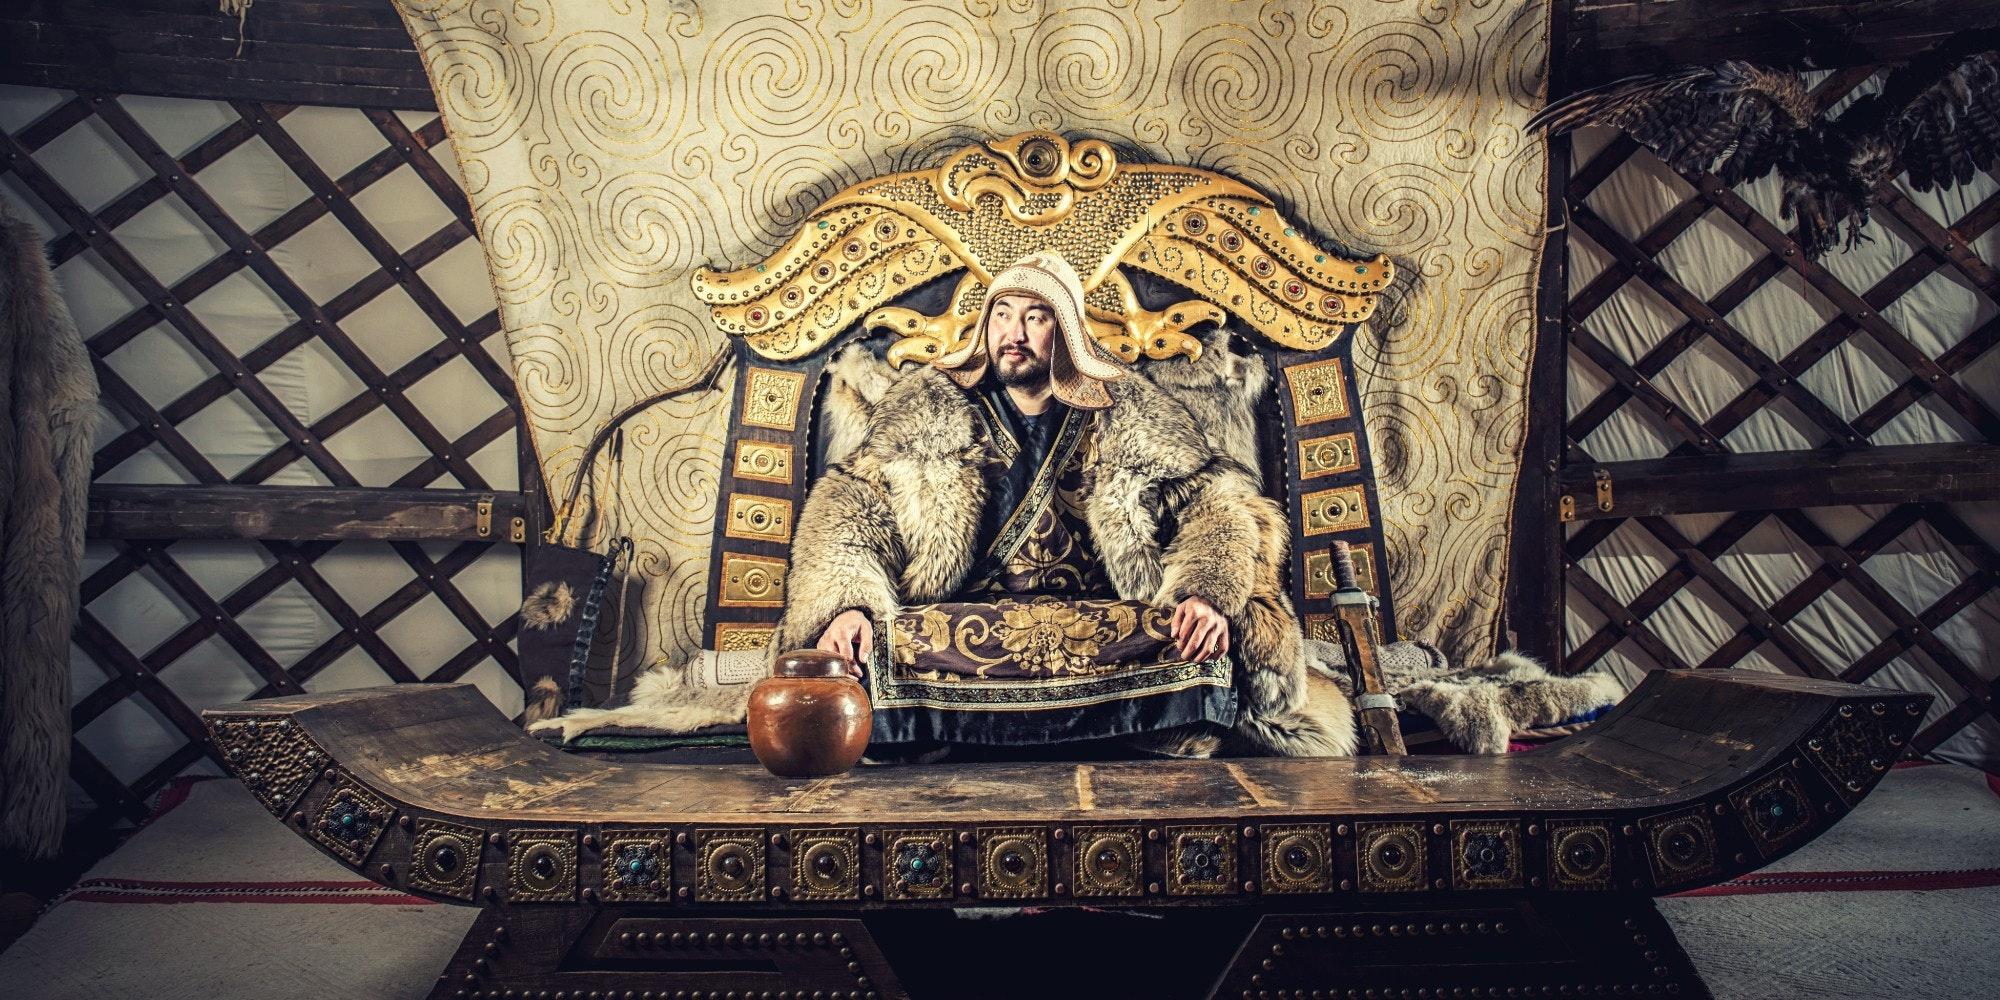 genghis khan canceled